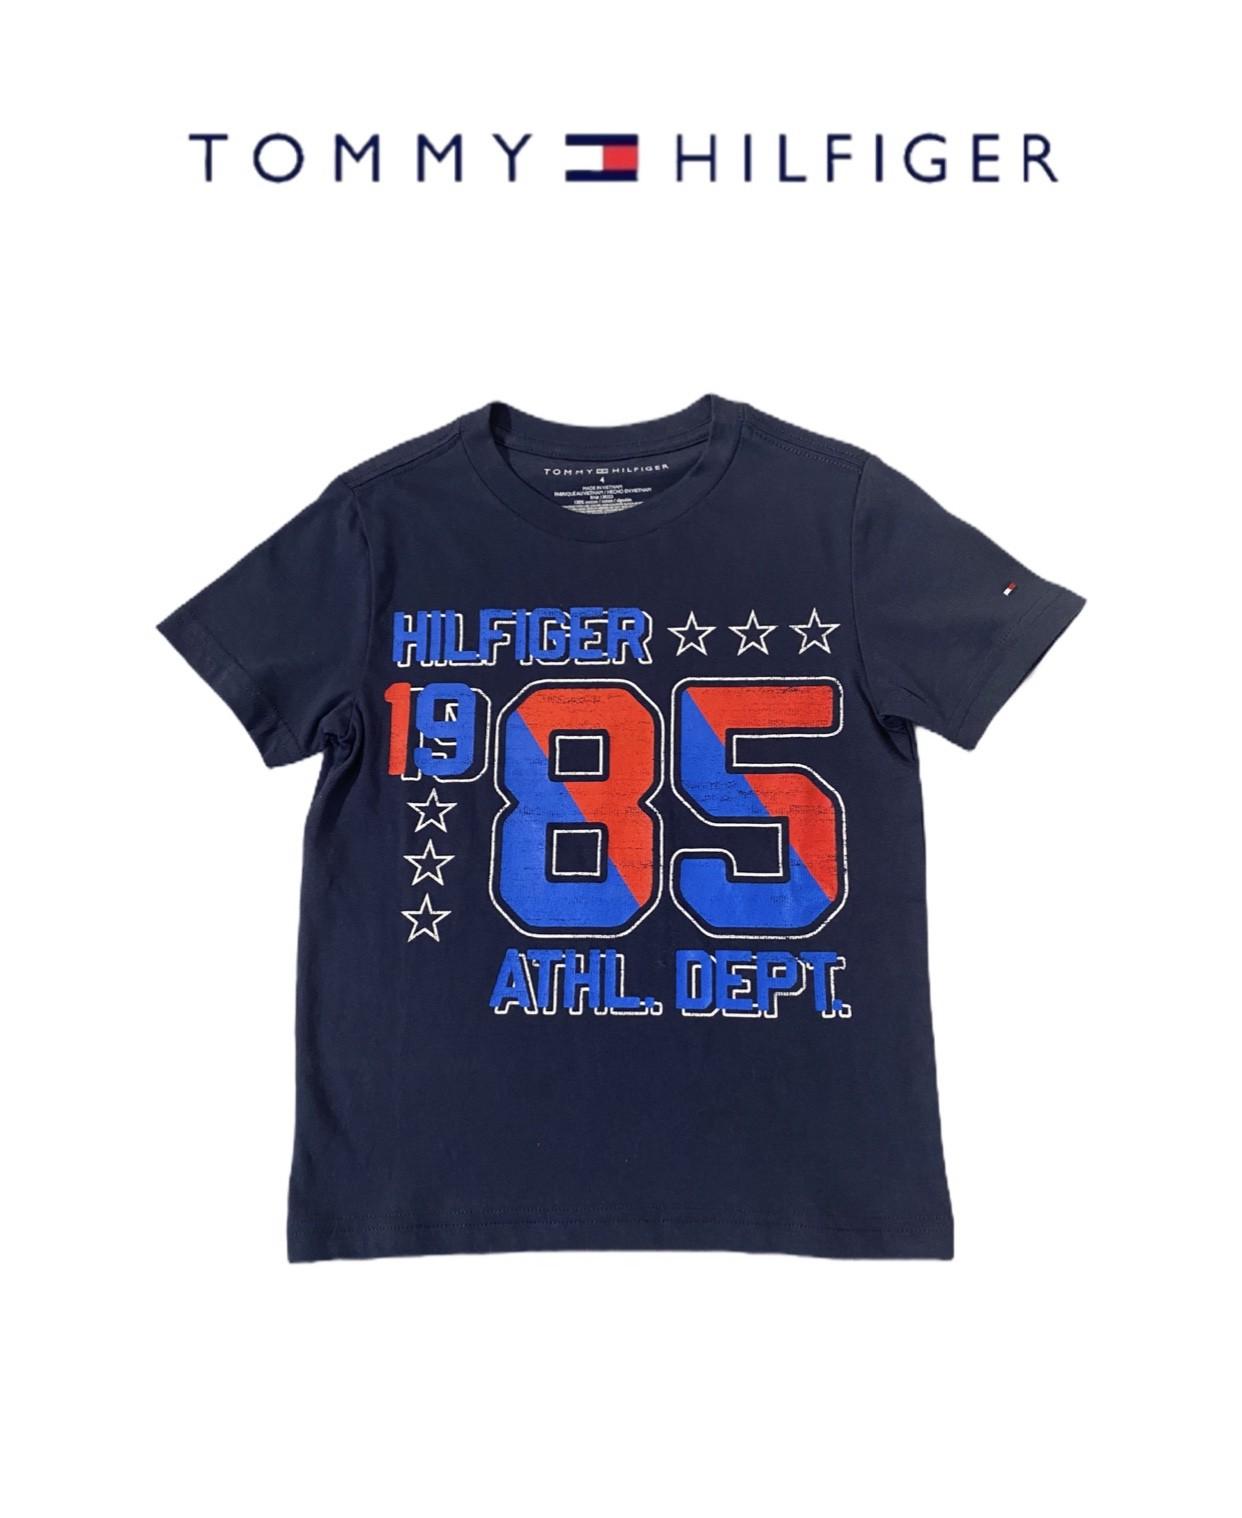 CAMISETA TOMMY HILFIGER® AZUL 1985